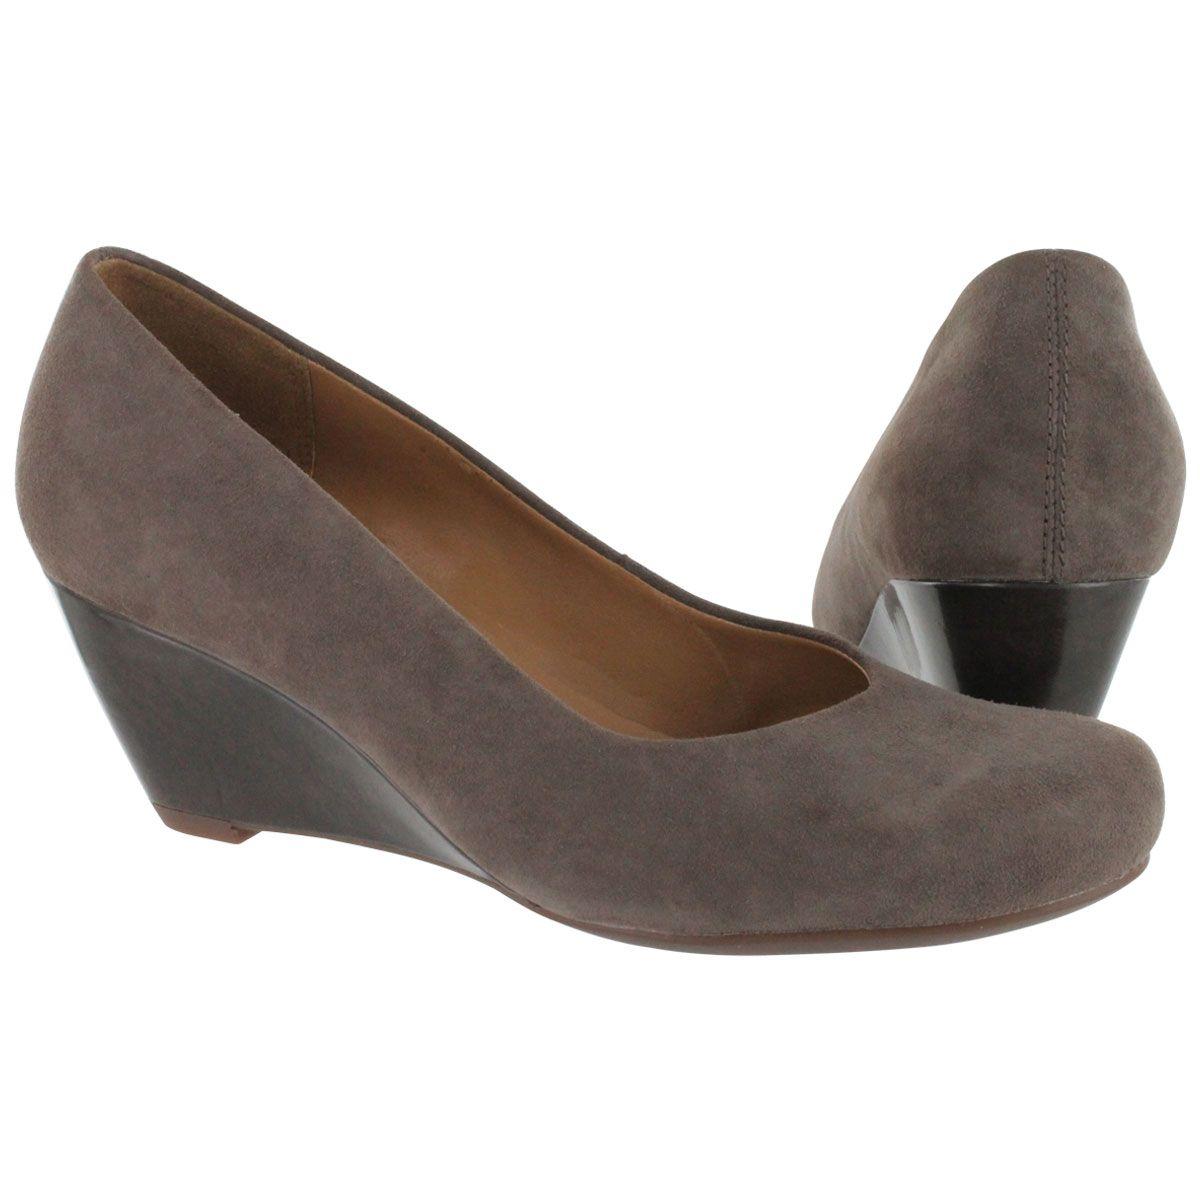 Womens Shoes Clarks Bassett Mine Grey Suede